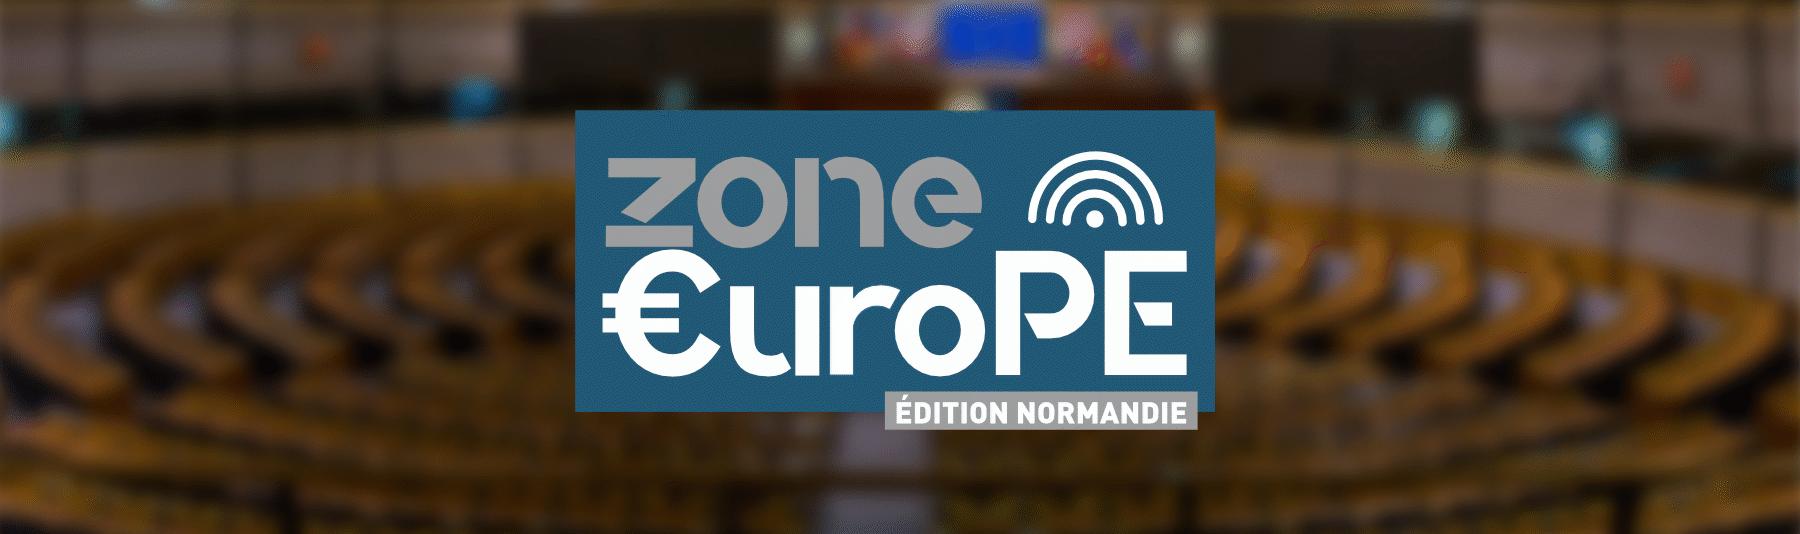 Zone €uroPE - Edition Normandie